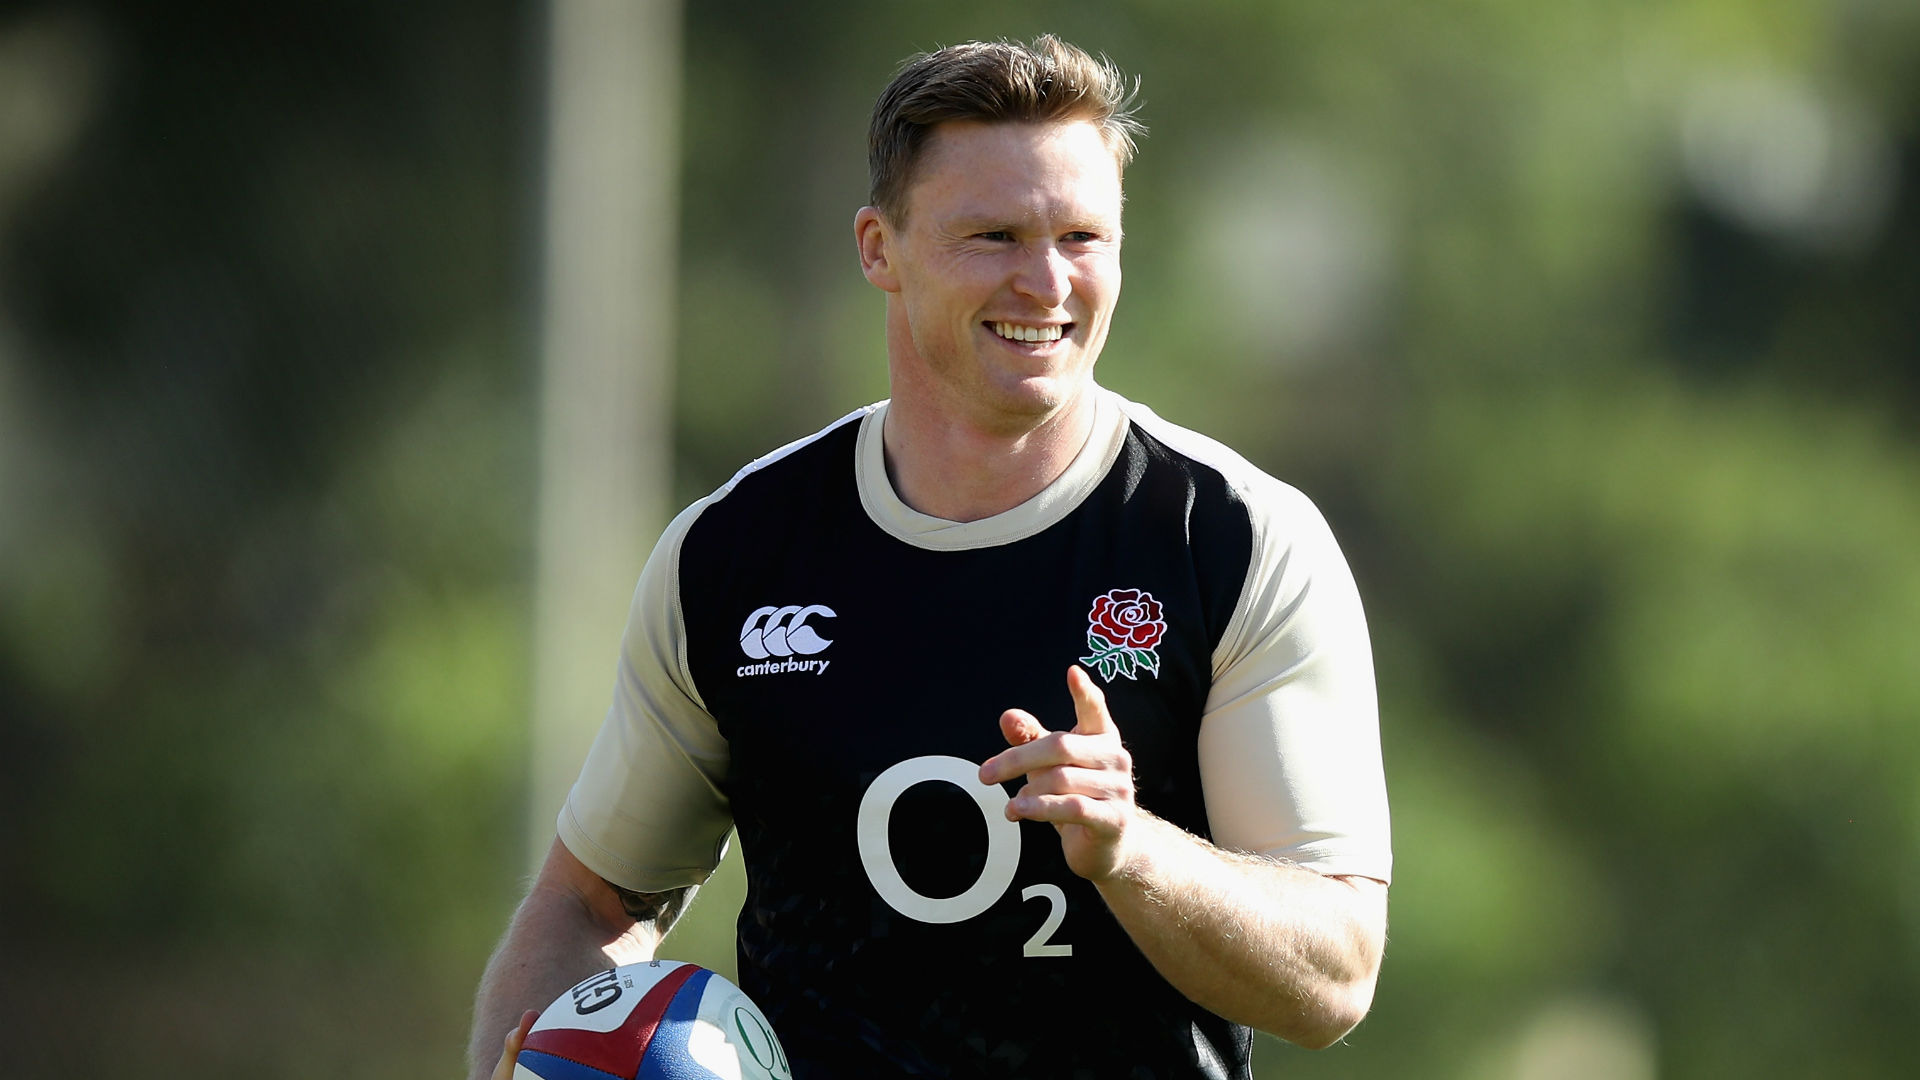 Ashton replaces injured Tuilagi on England bench